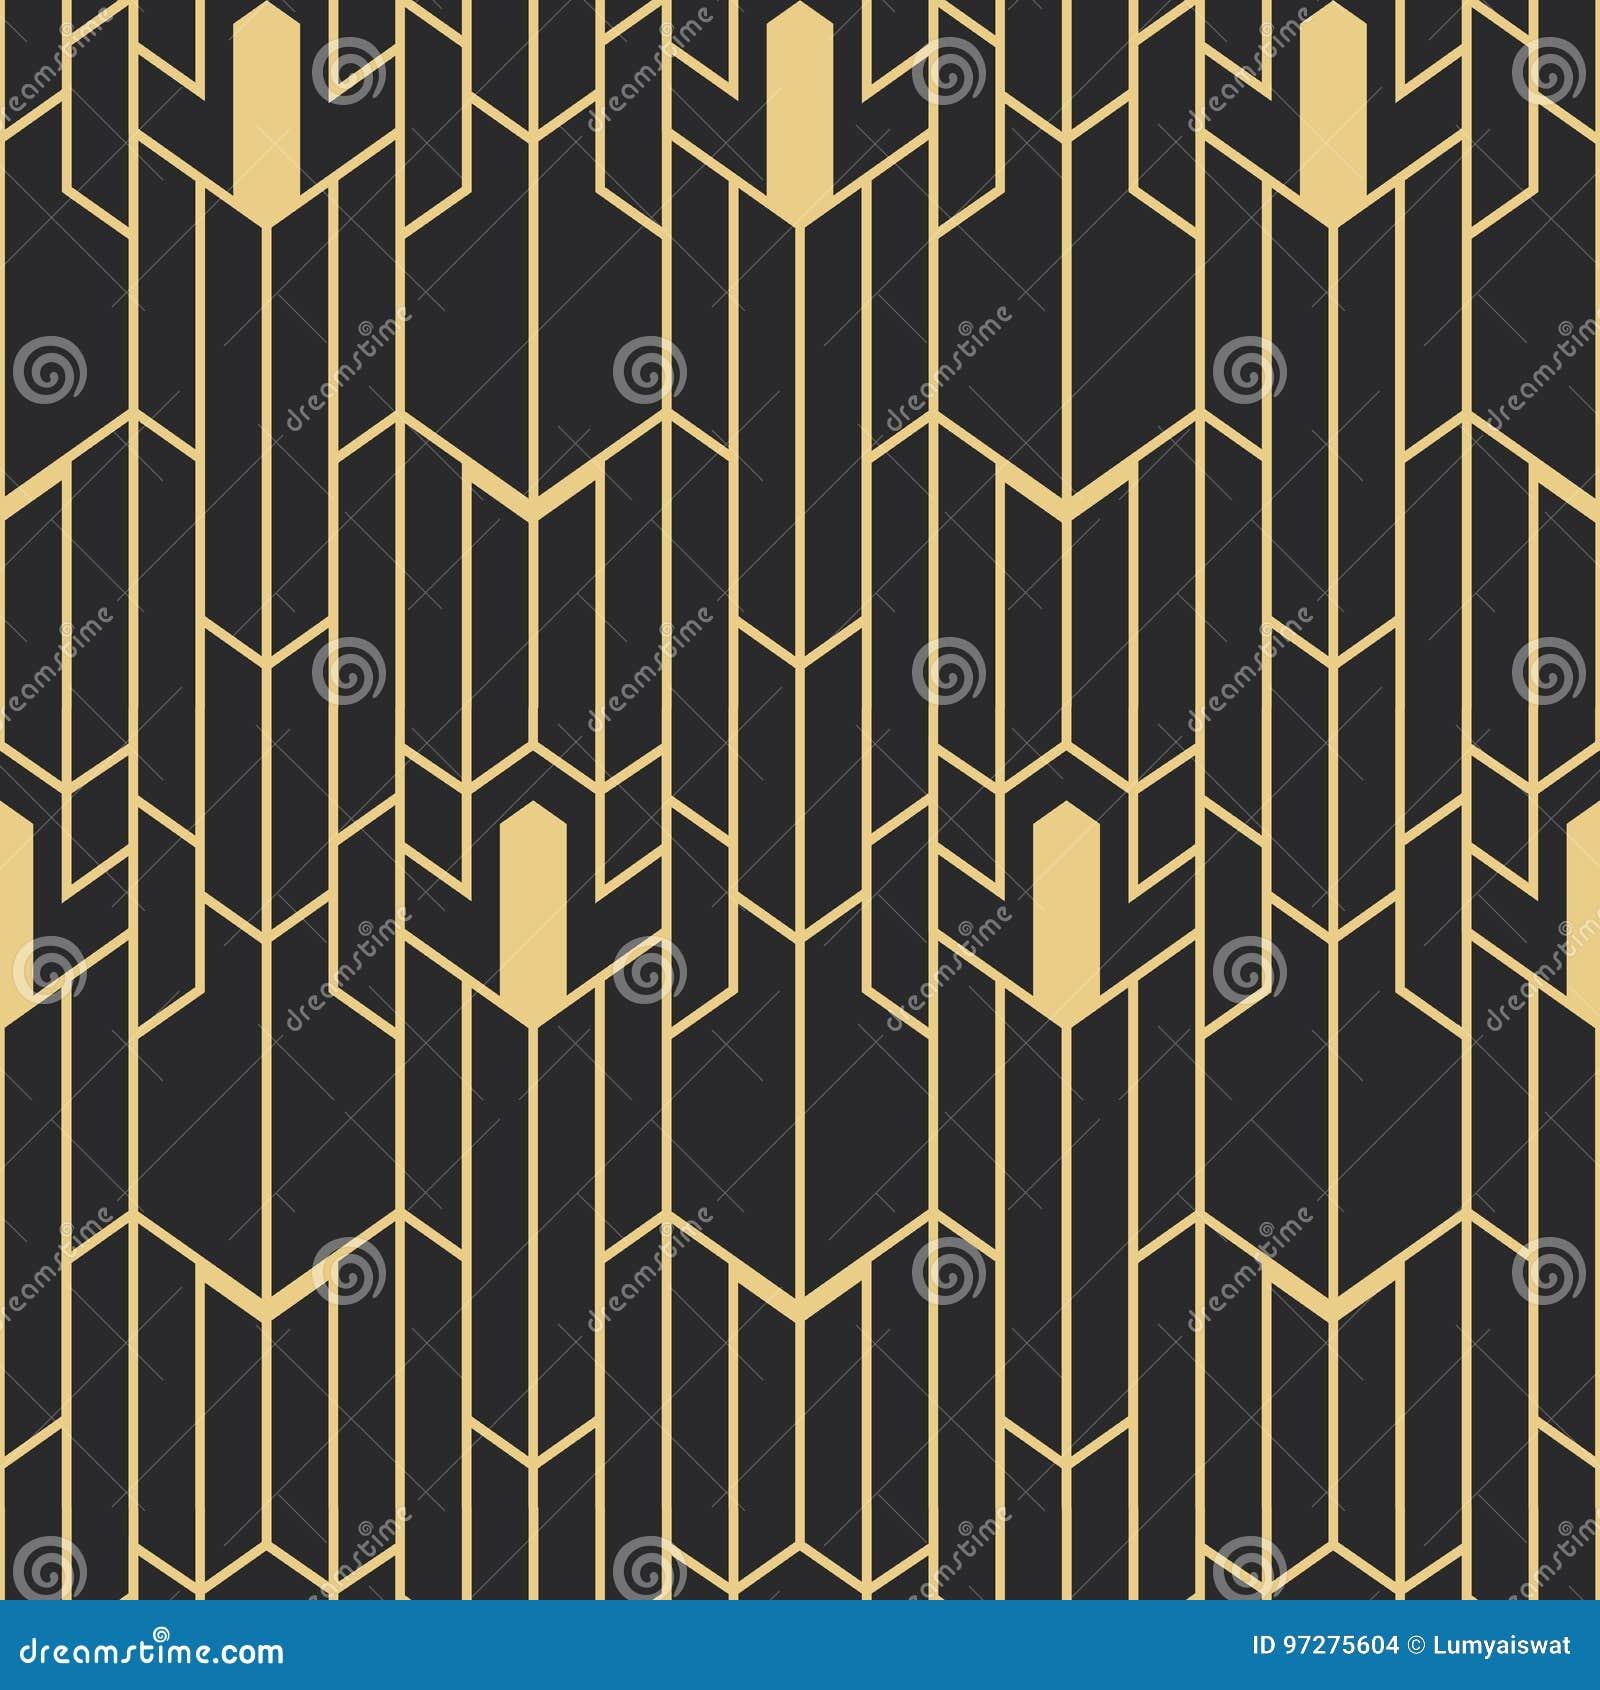 Art Deco Meubelstof.Abstract Art Deco Seamless Pattern Stock Vector Illustration Of